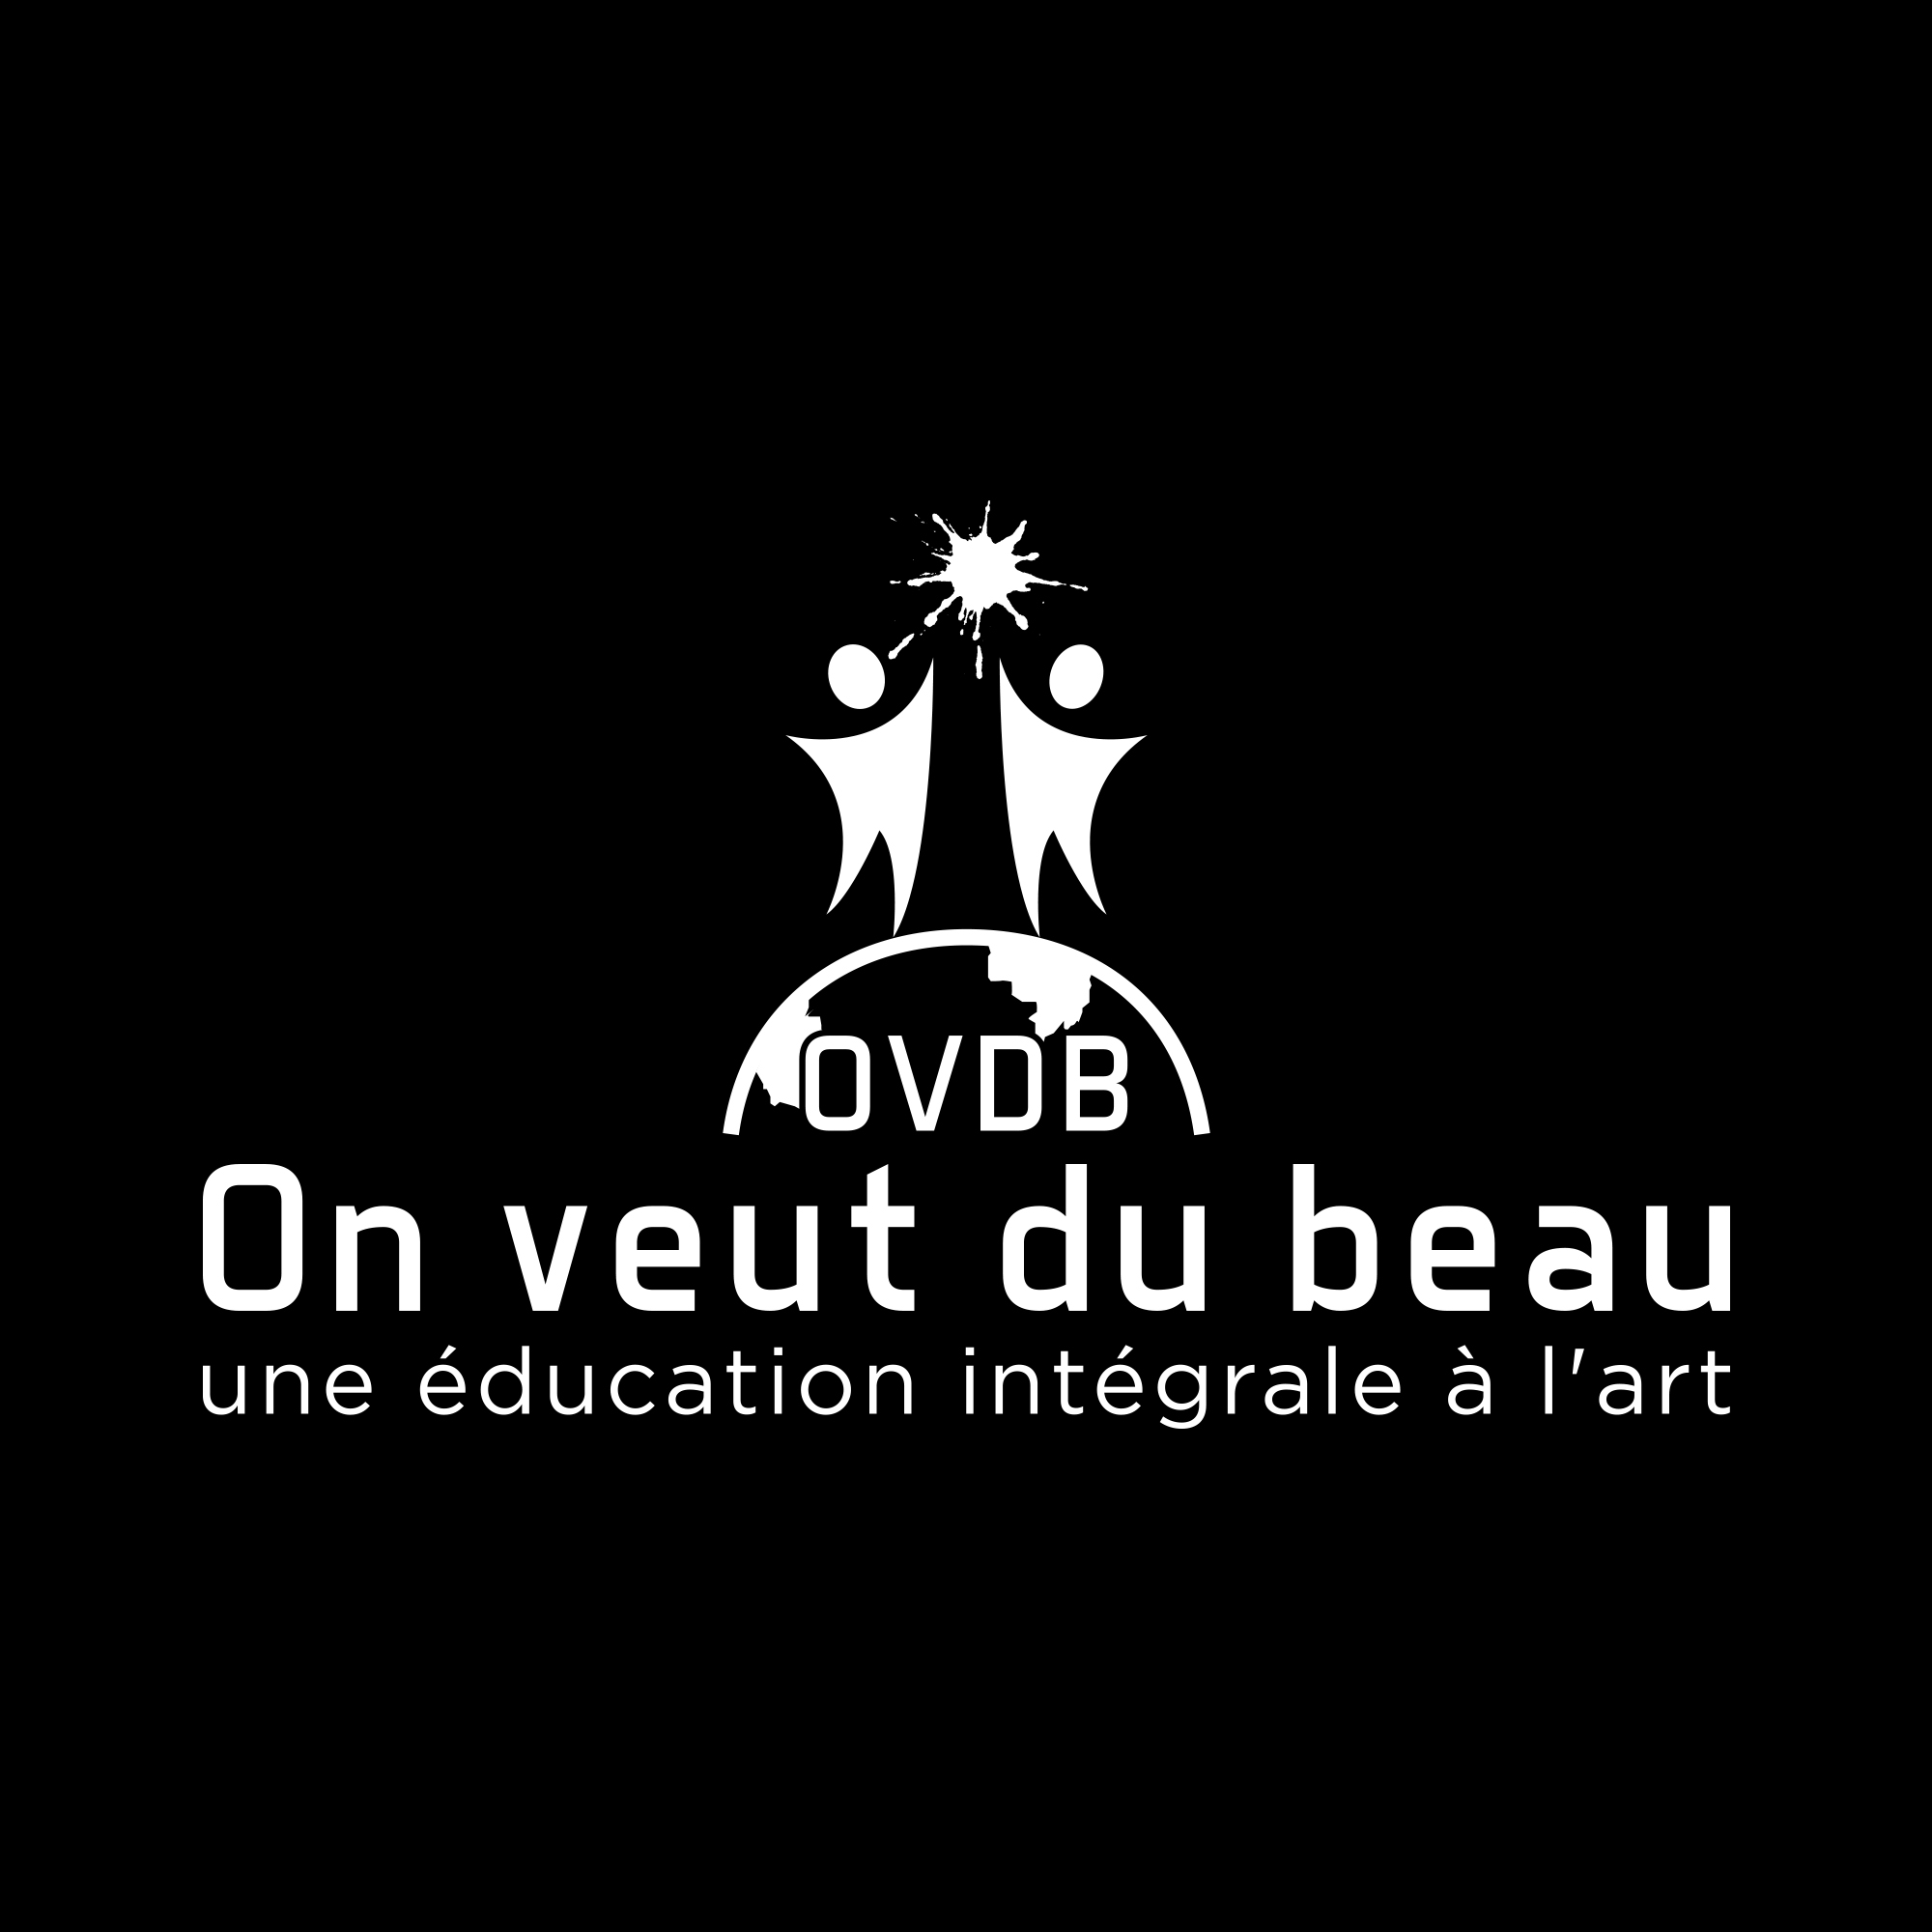 ovdb.fr